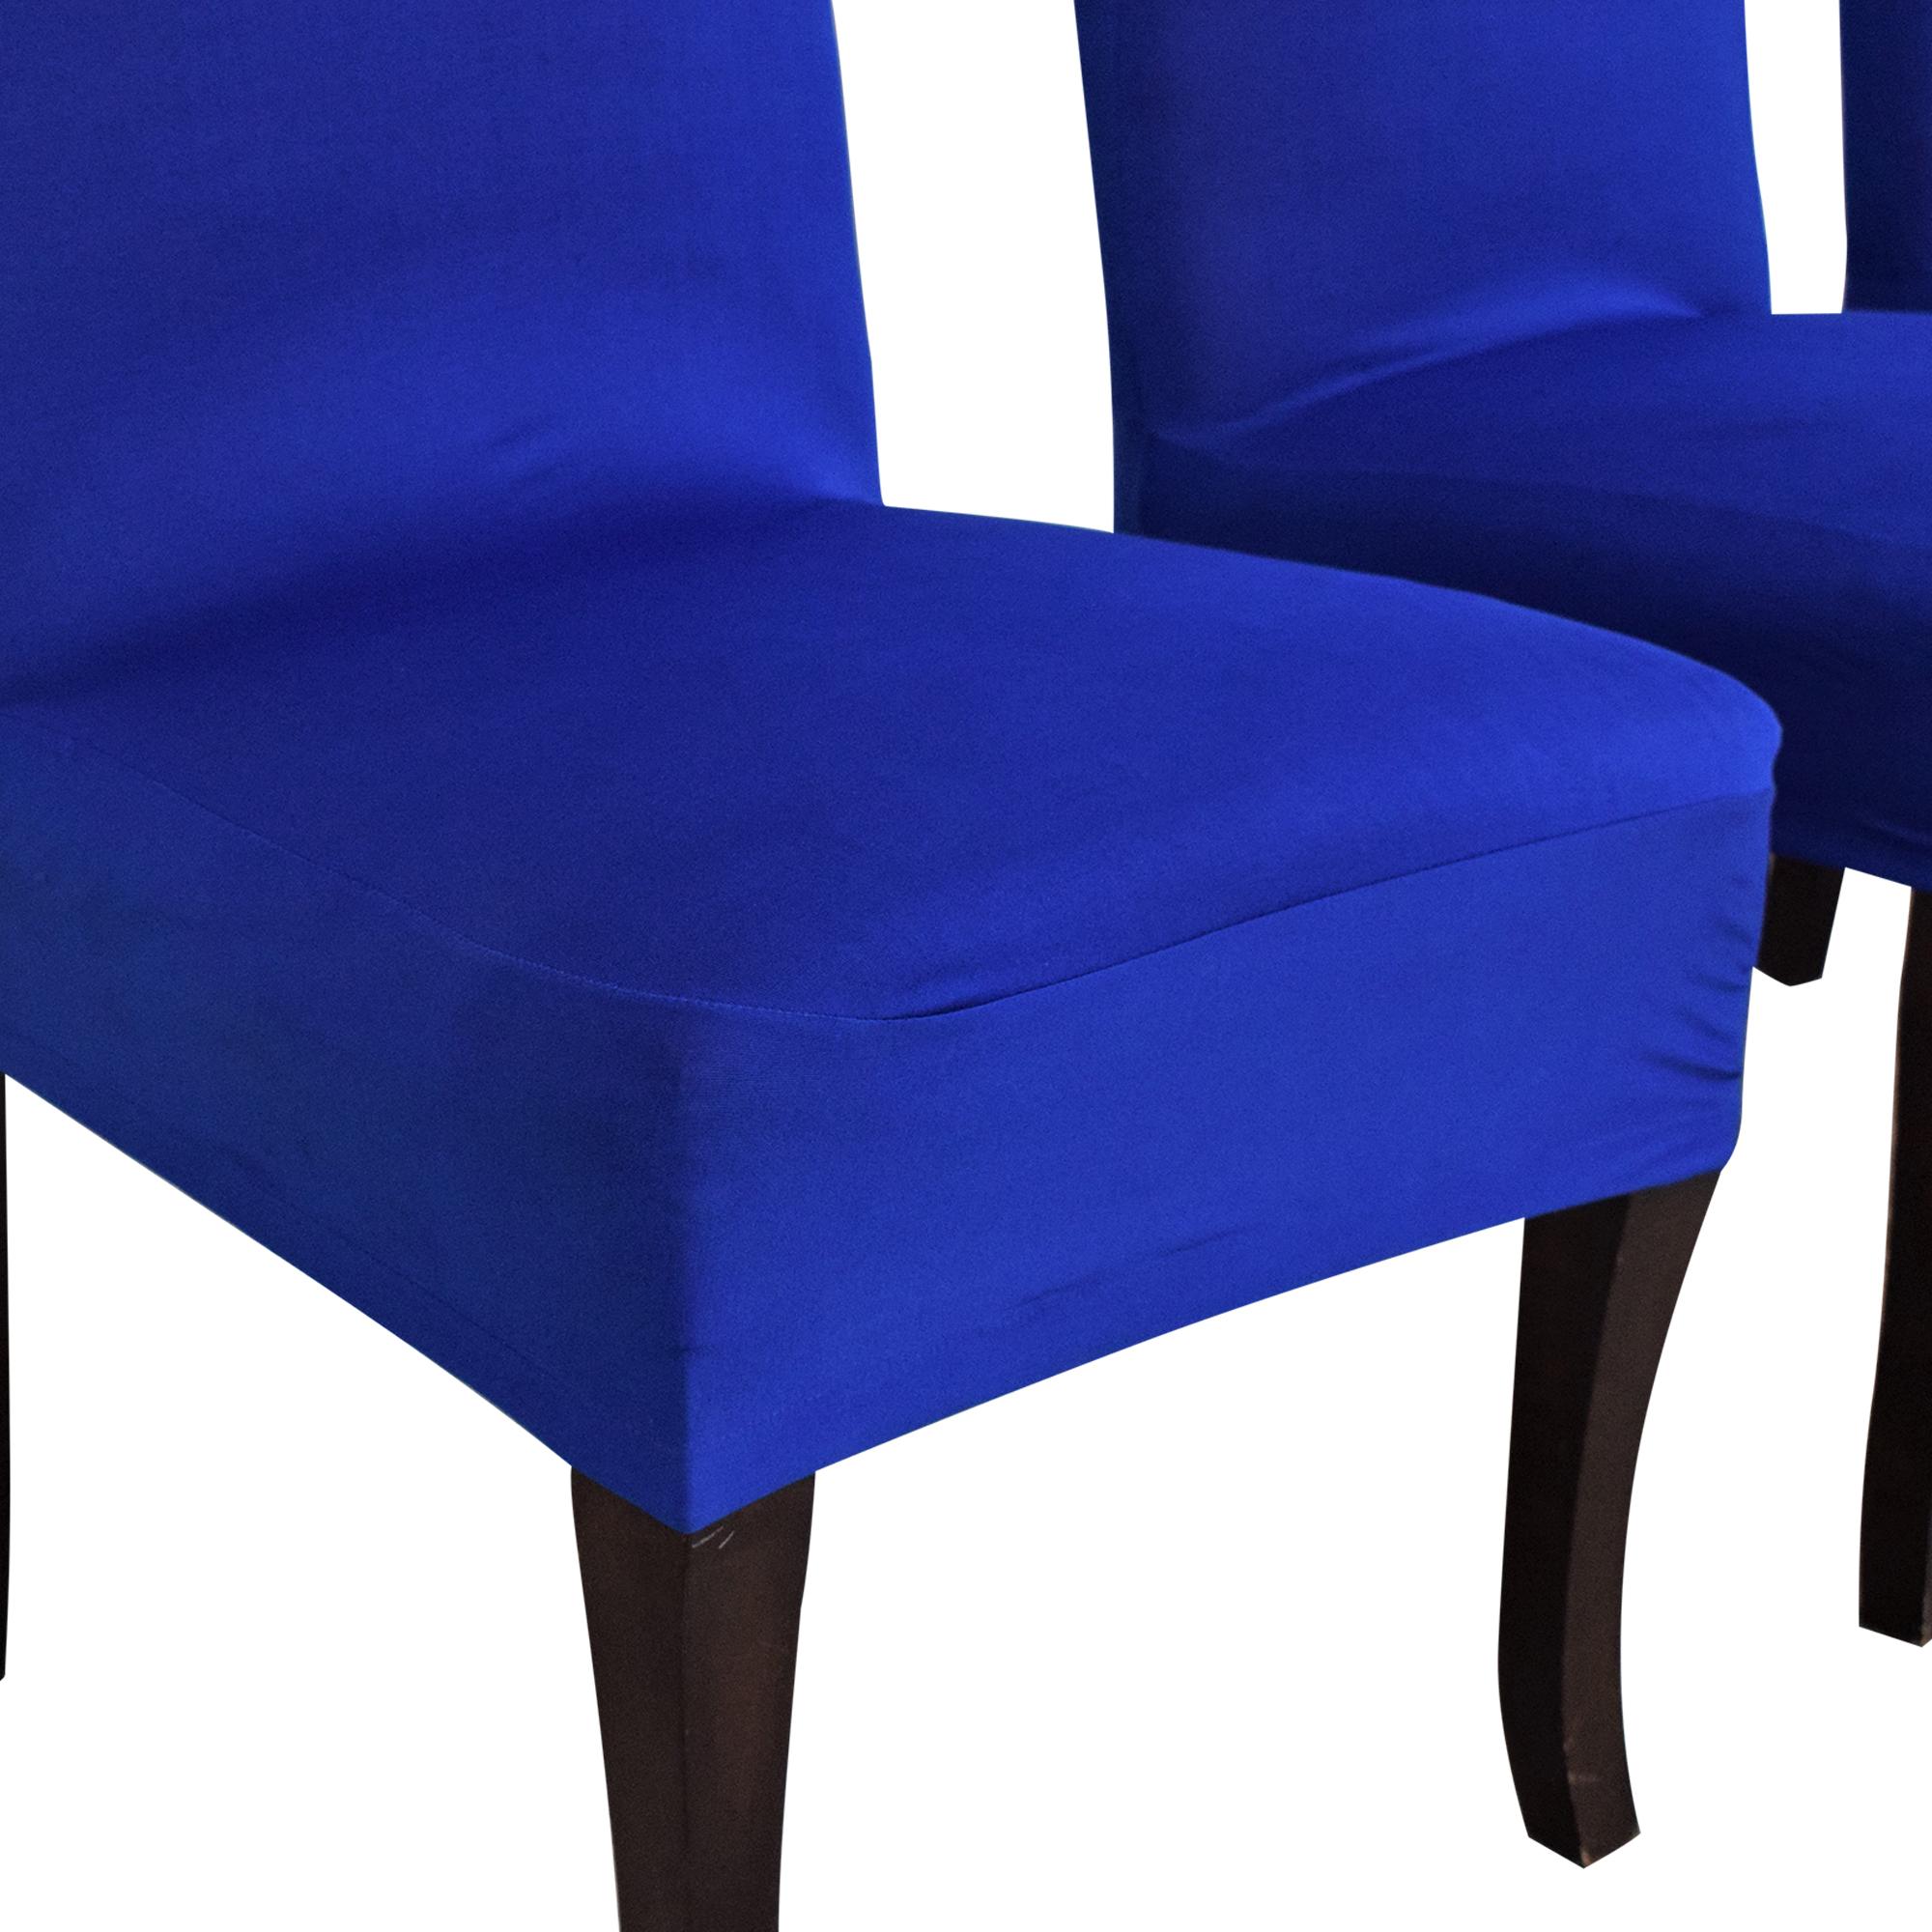 Ballard Designs Ballard Designs Upholstered Couture Chairs nj